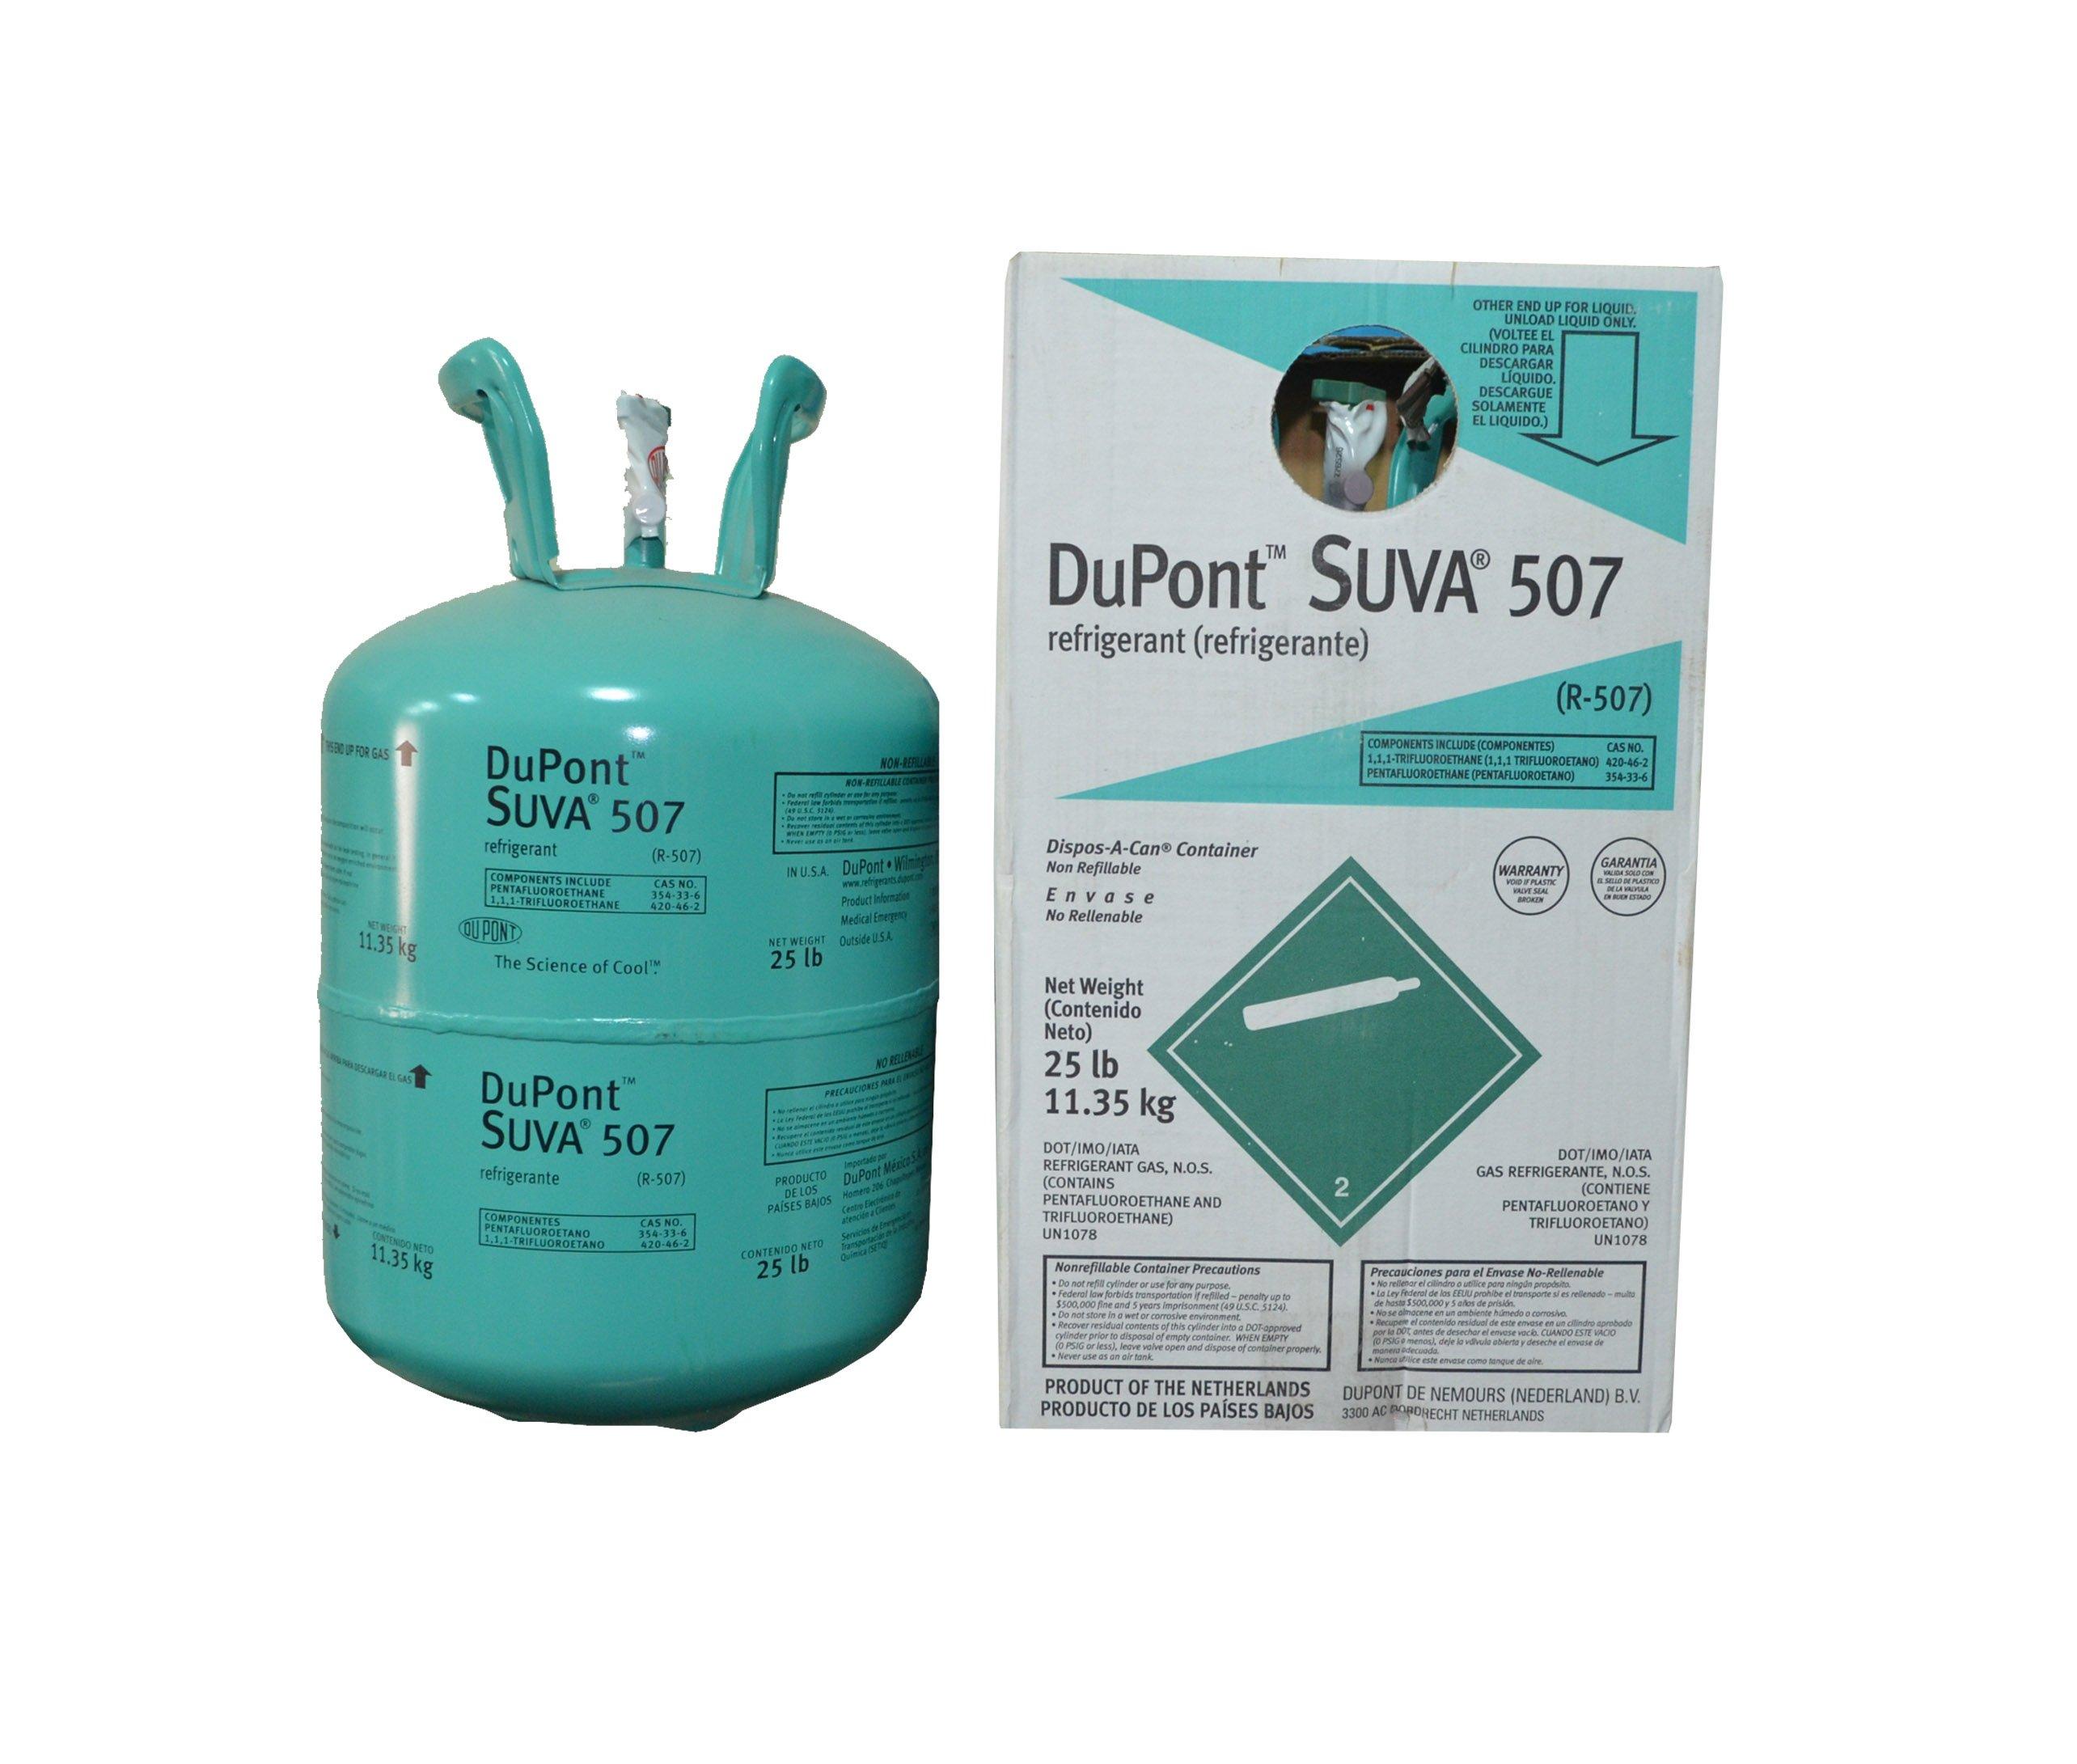 DuPont 507 Image